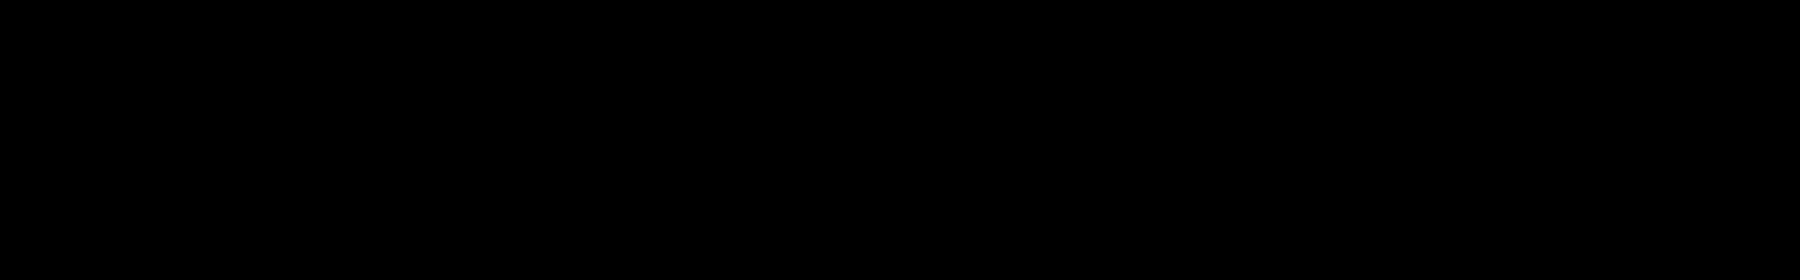 SWAVEY audio waveform